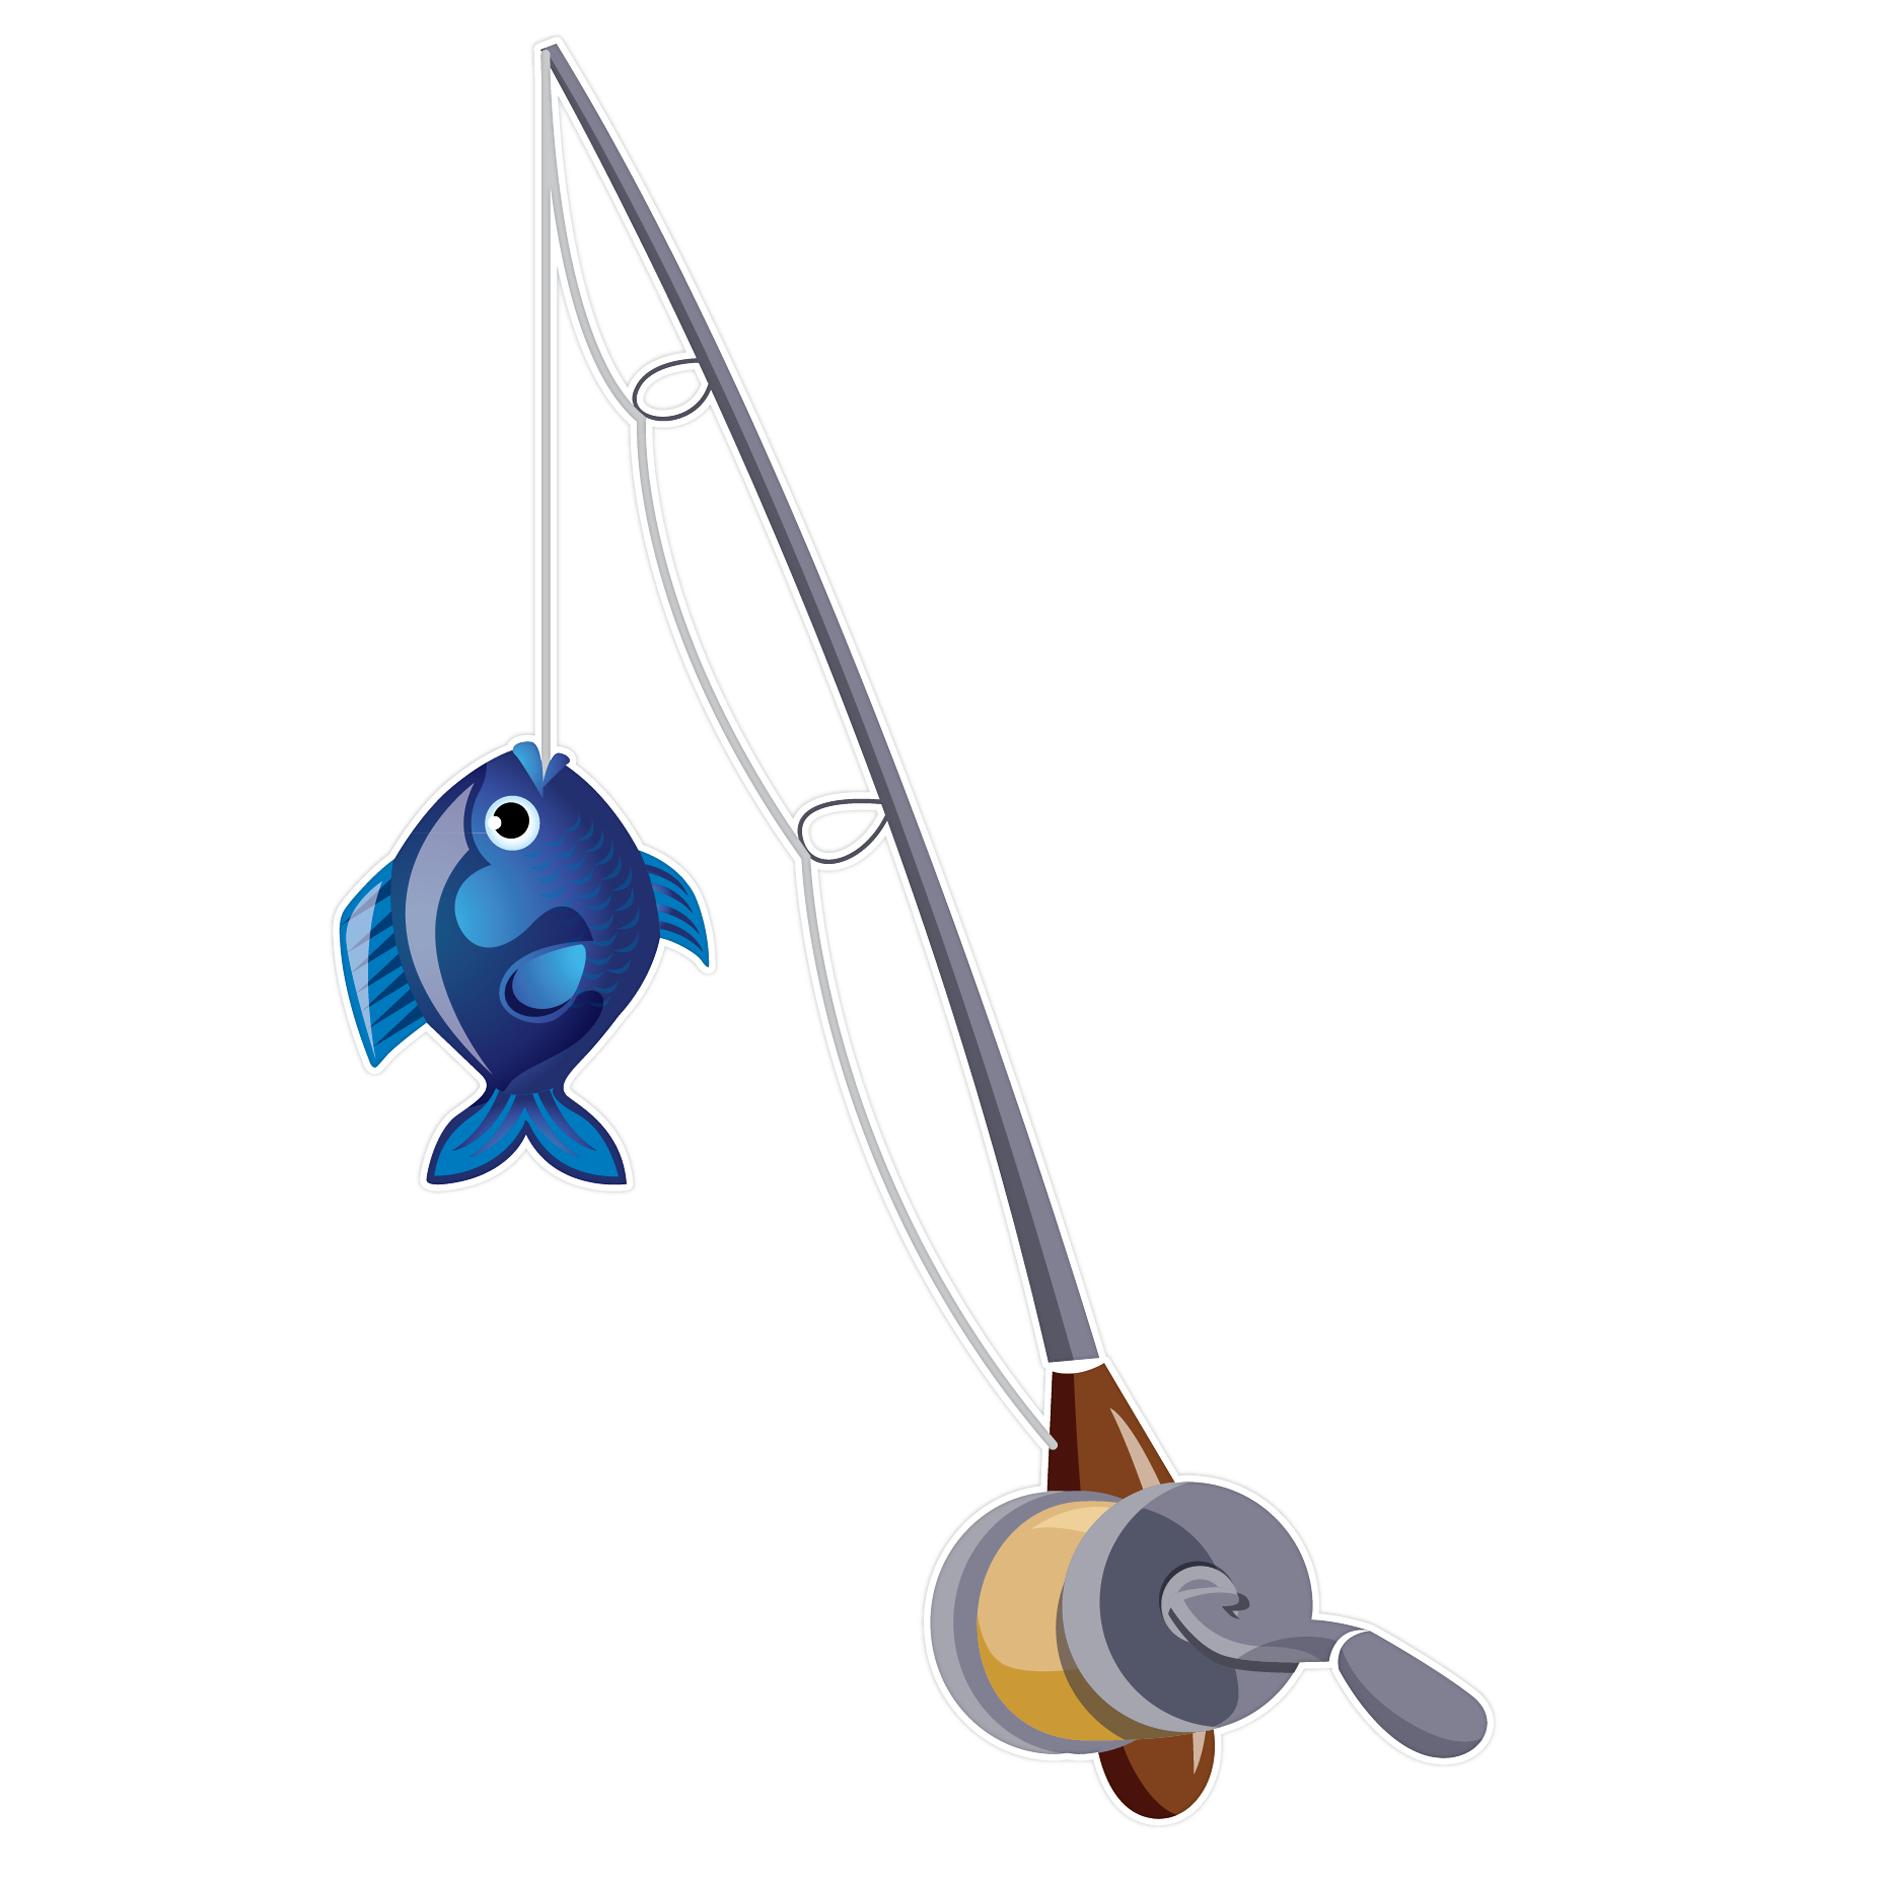 Fishing Pole Clipart Fishing Rod Image 3-Fishing pole clipart fishing rod image 3-6